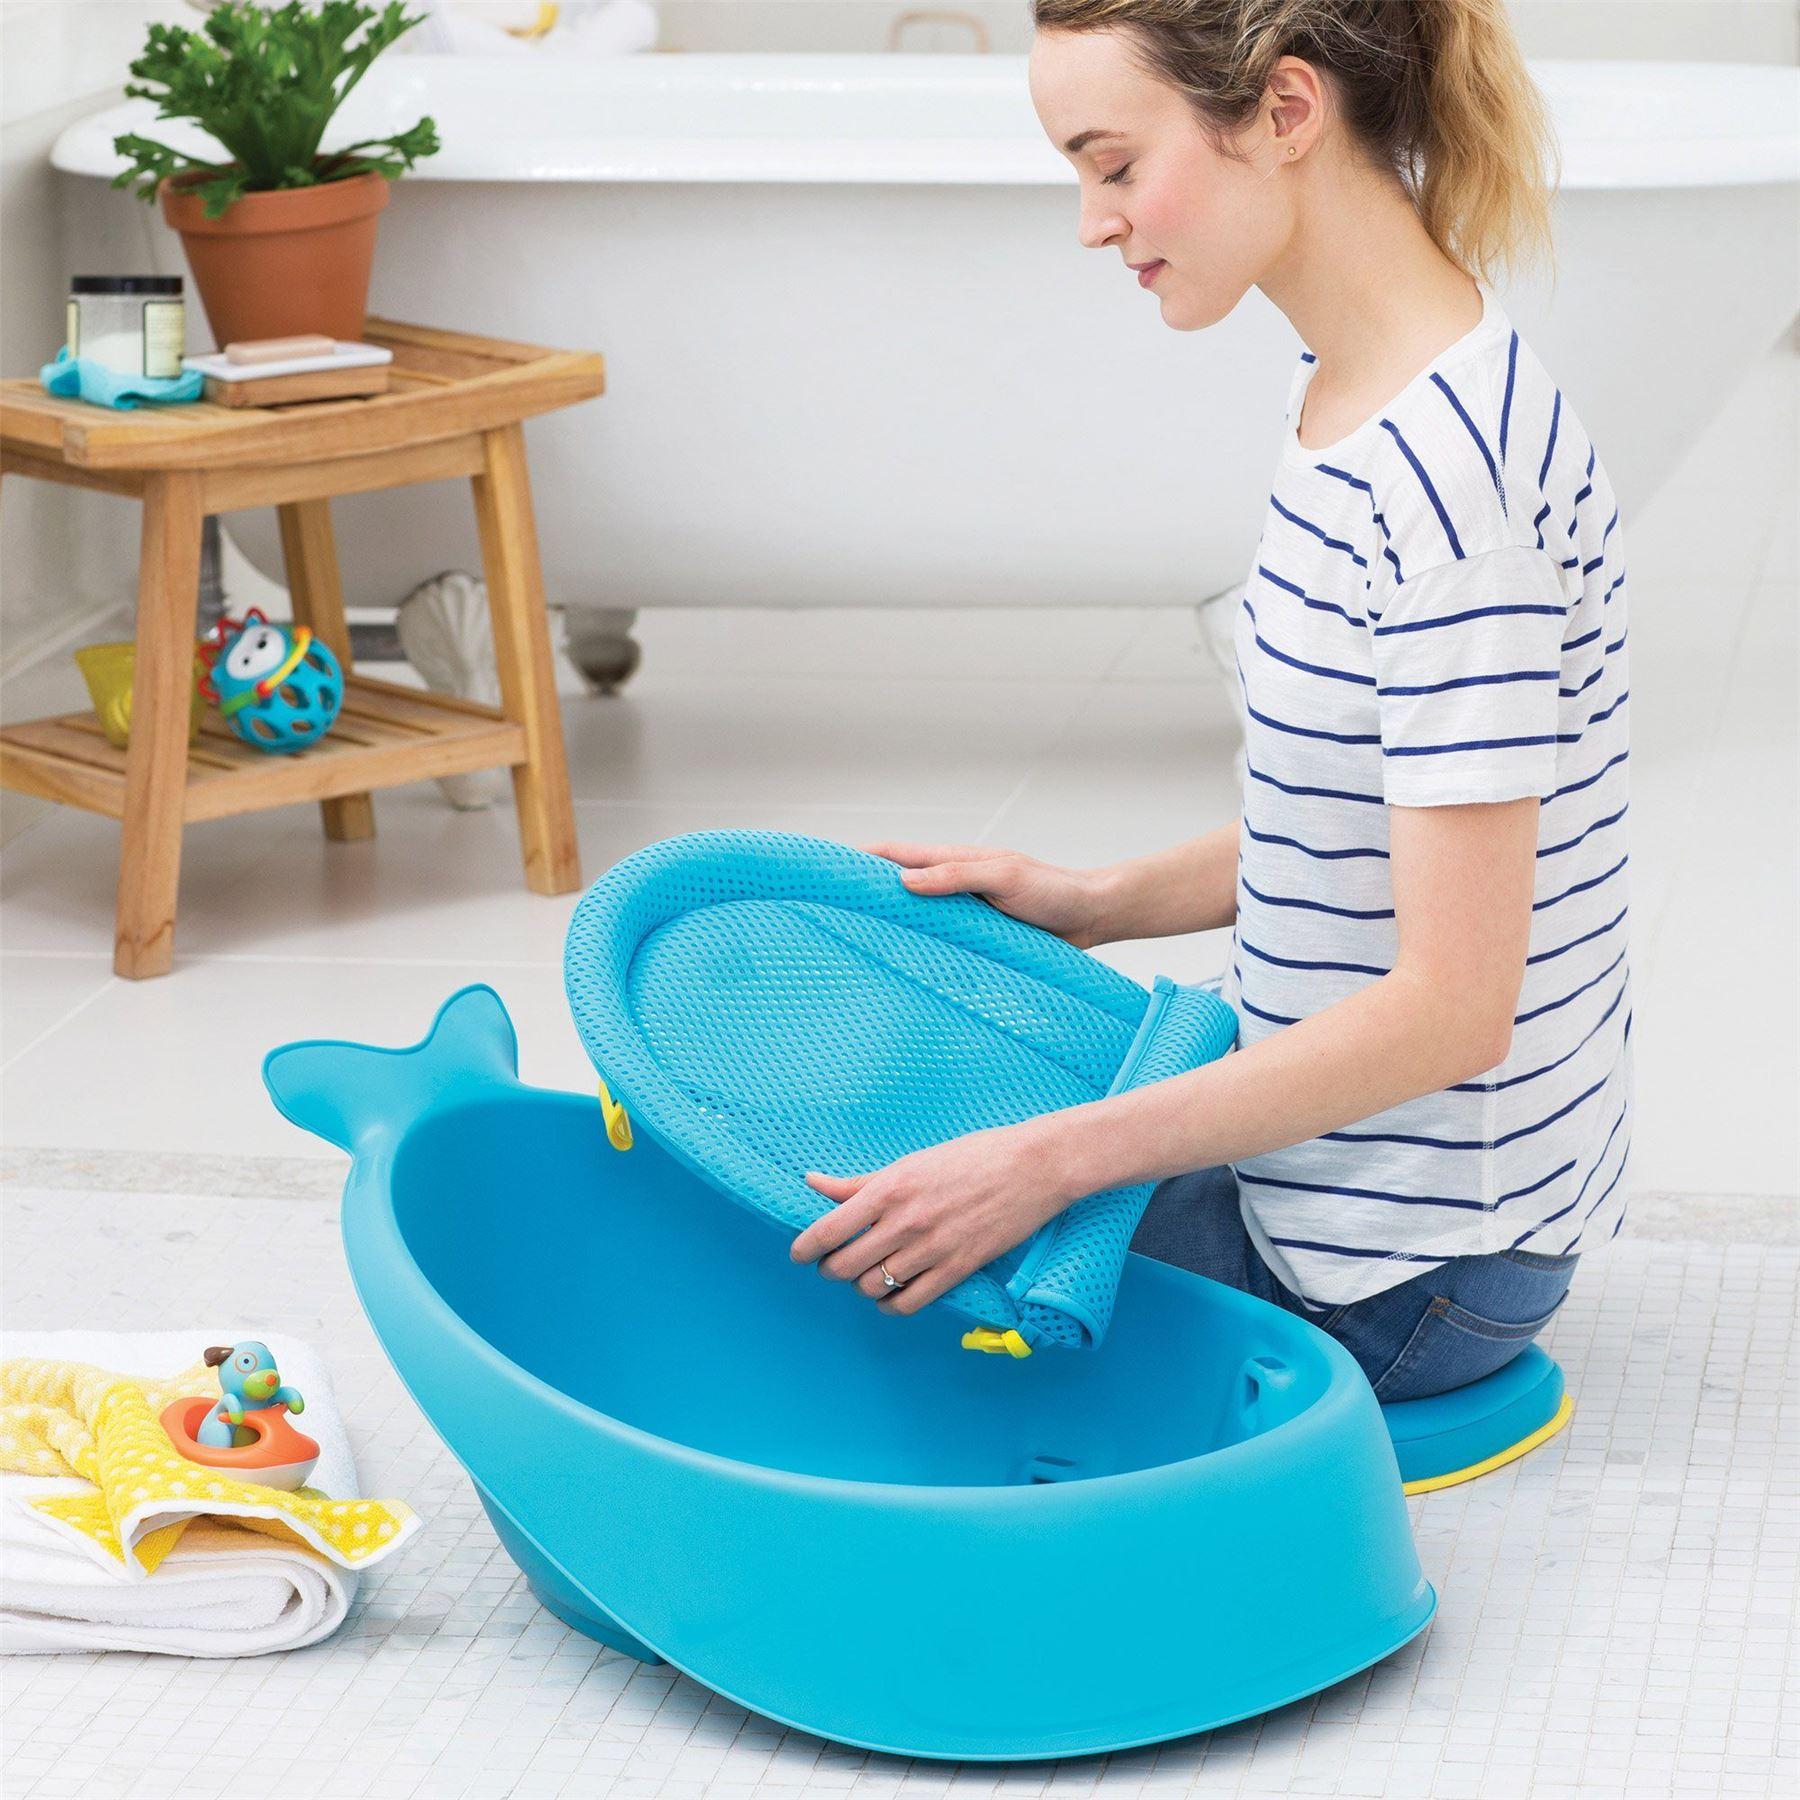 Moby Smart Sling 3-stage Baby Bath Tub 235465 Blue by Skip Hop | eBay